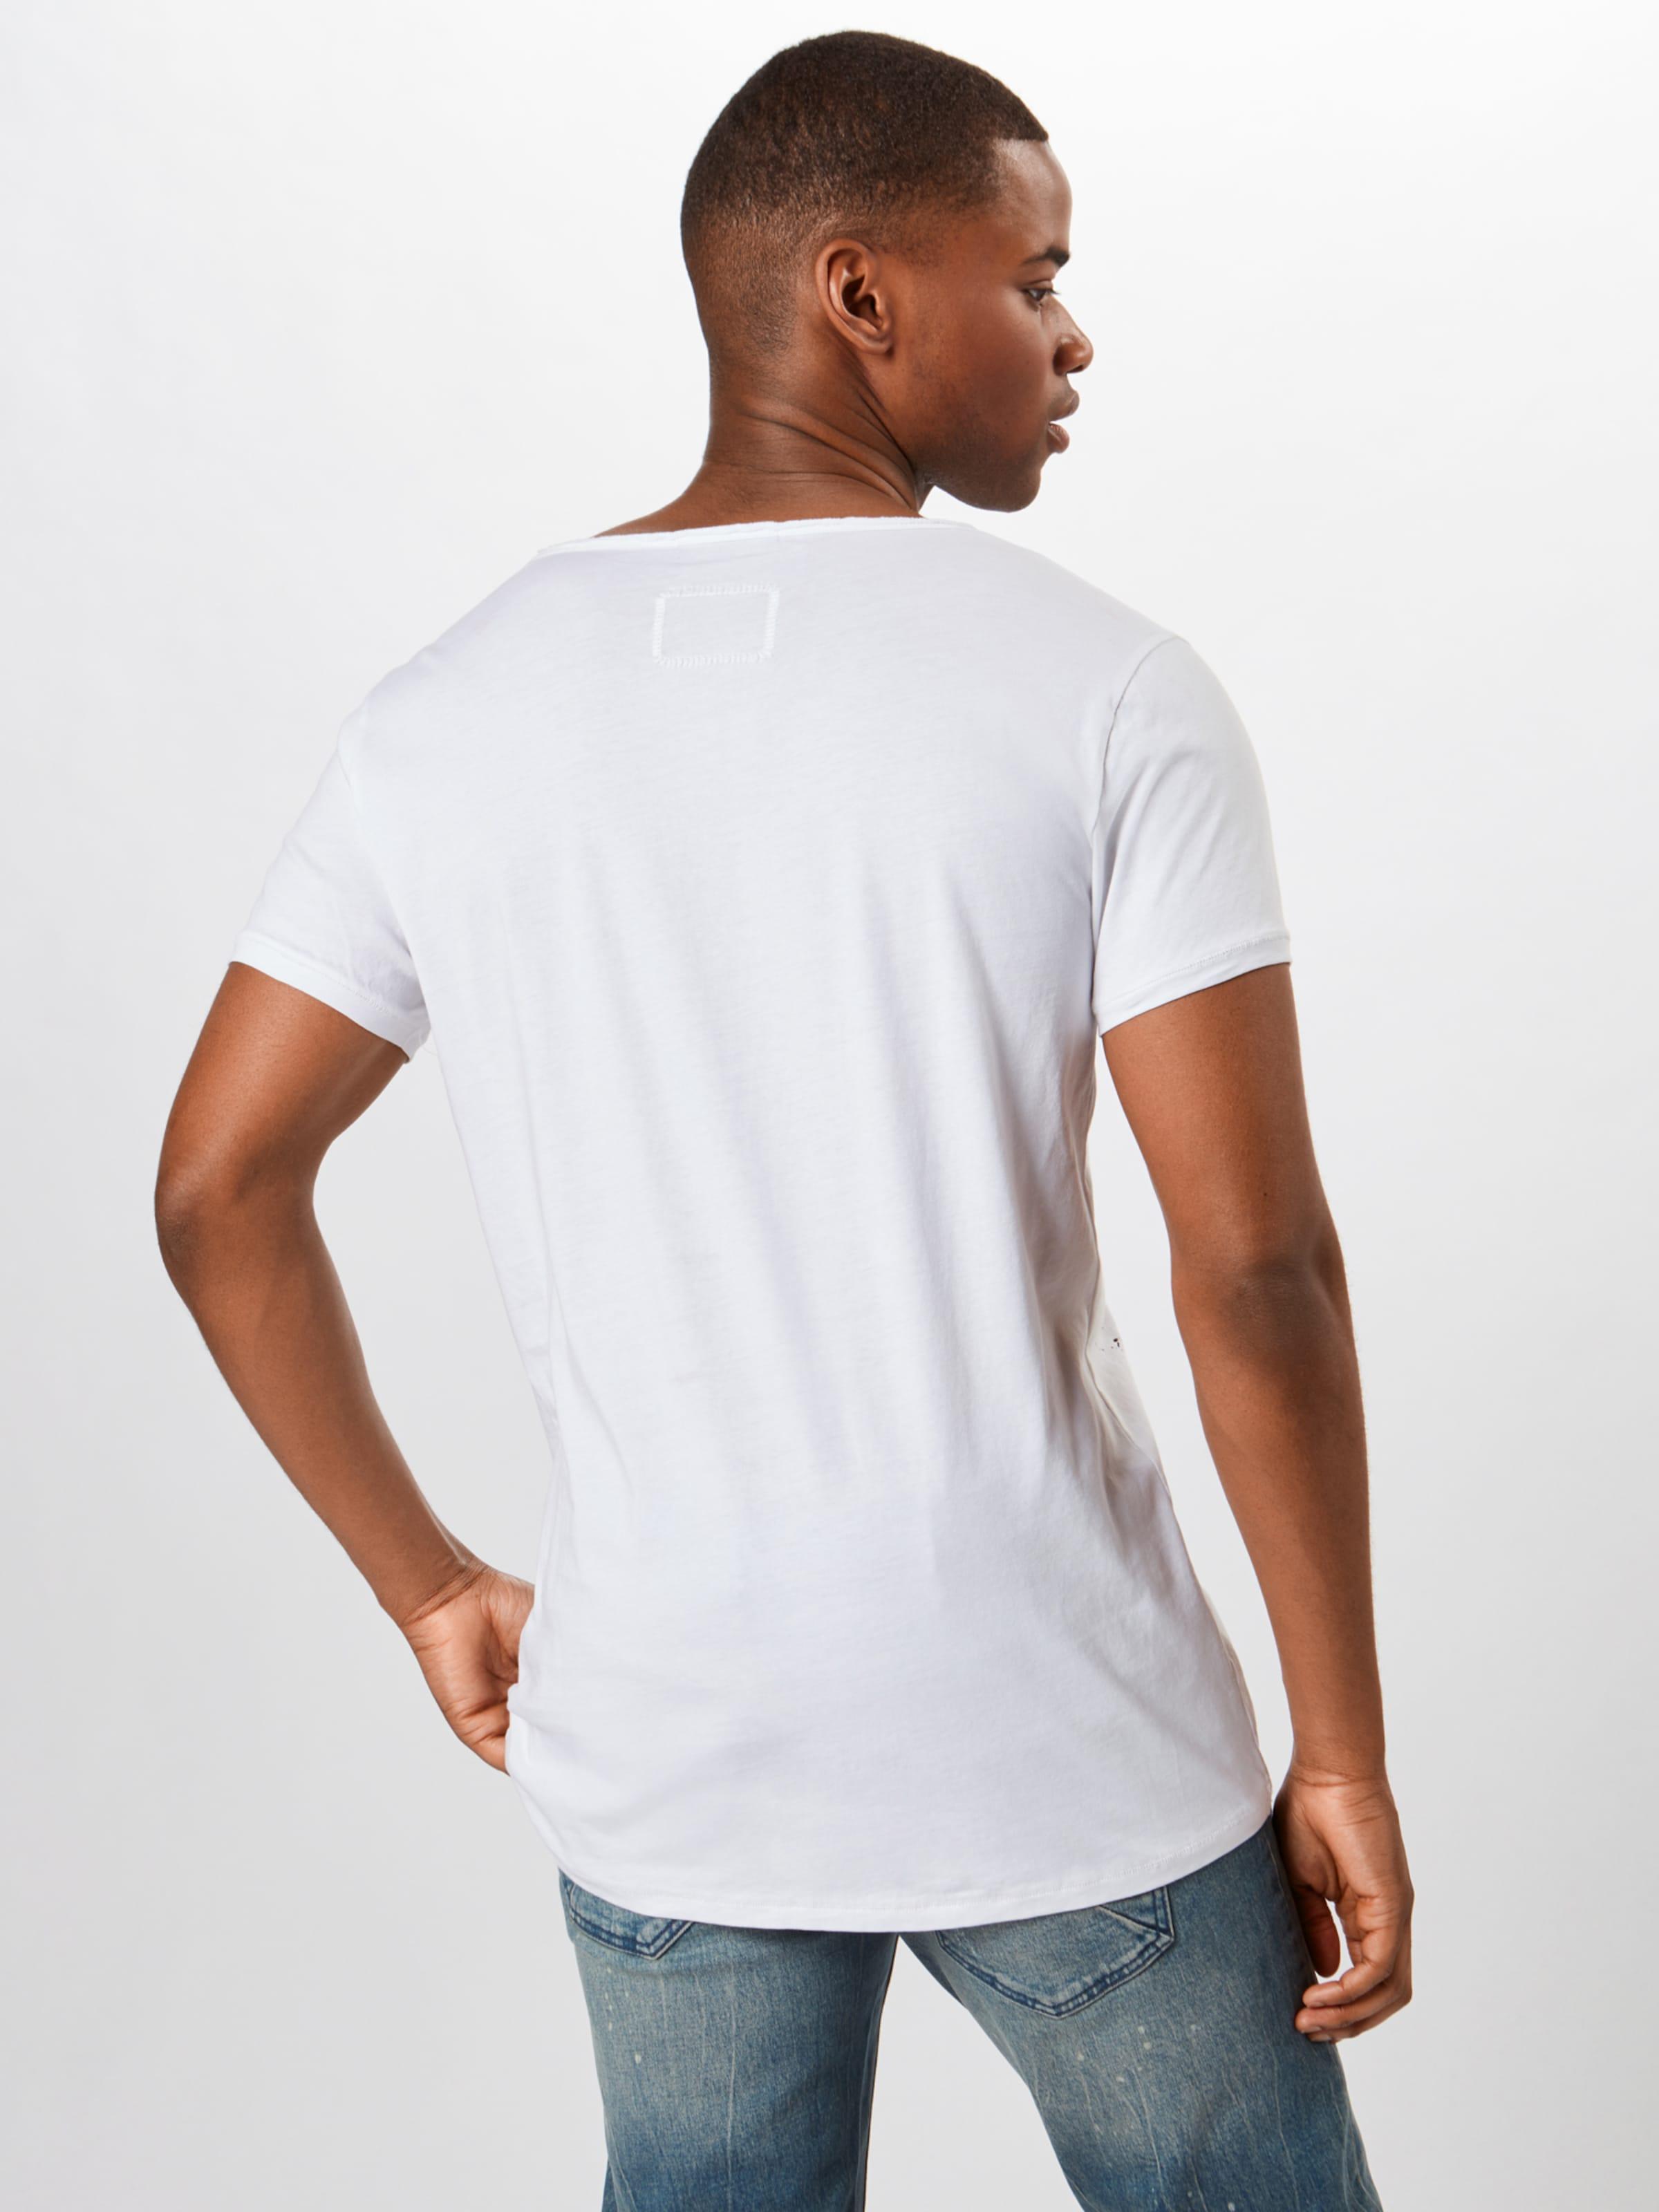 Tigha T En Tigha shirt shirt T NoirBlanc En v76yYbfg